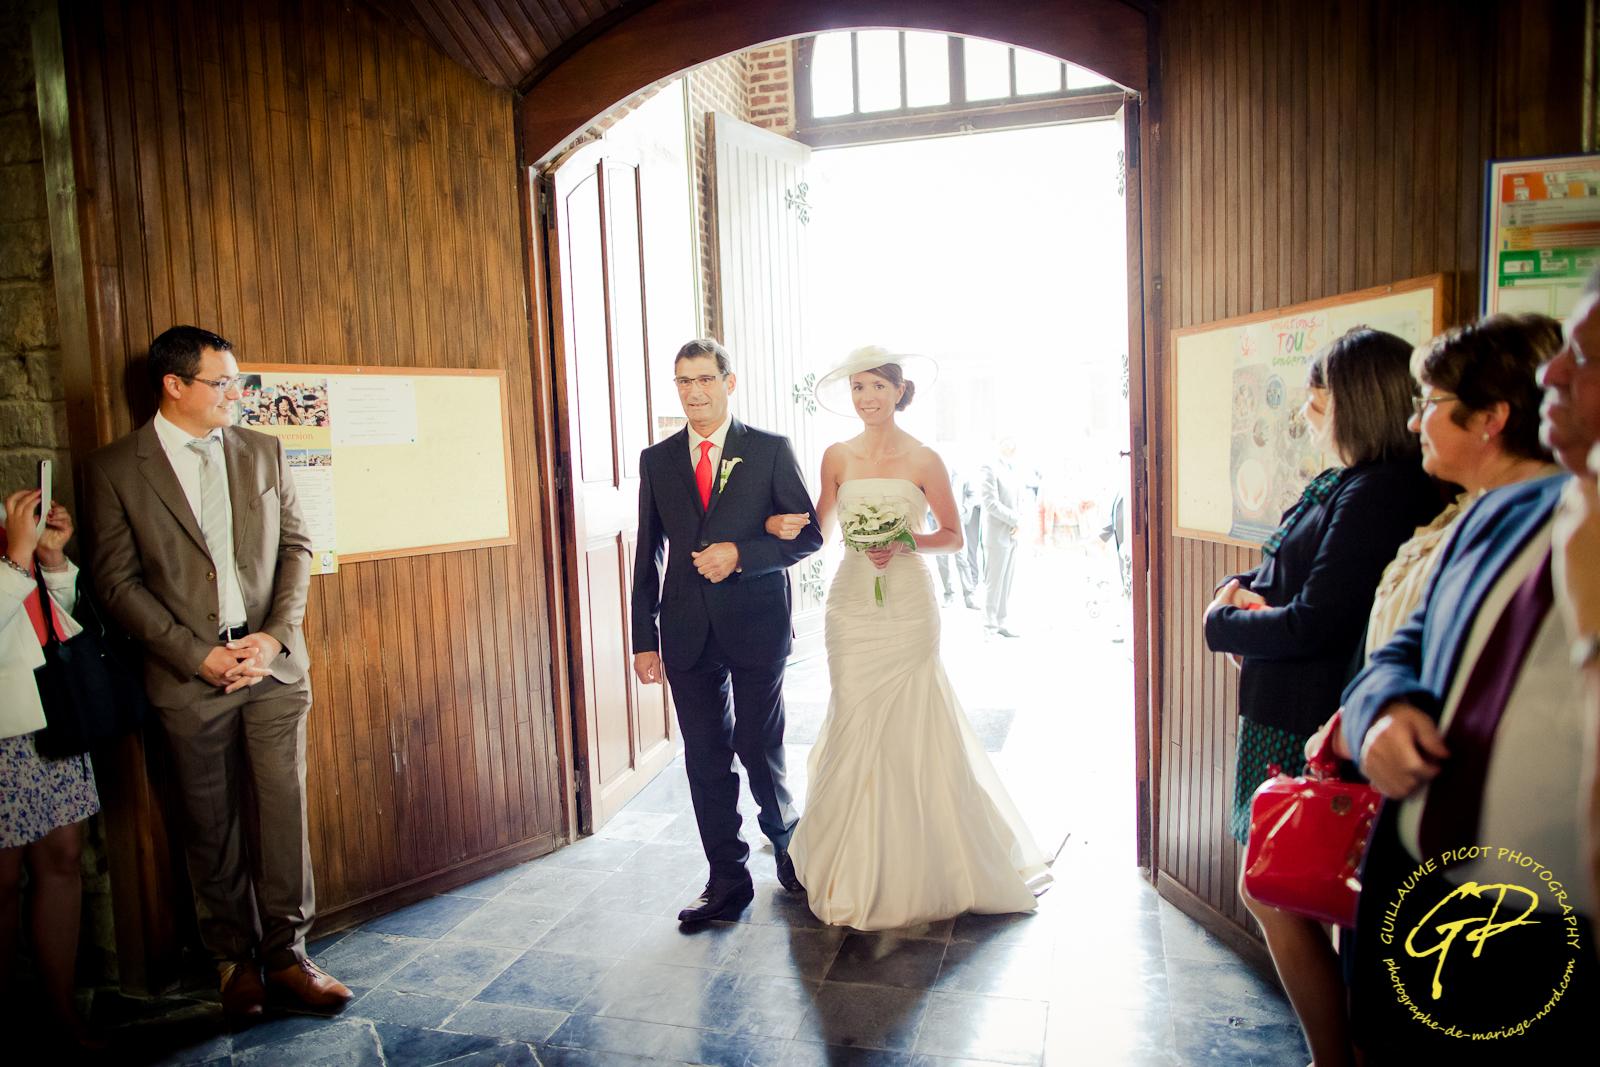 photographe mariage nord (45 sur 96)